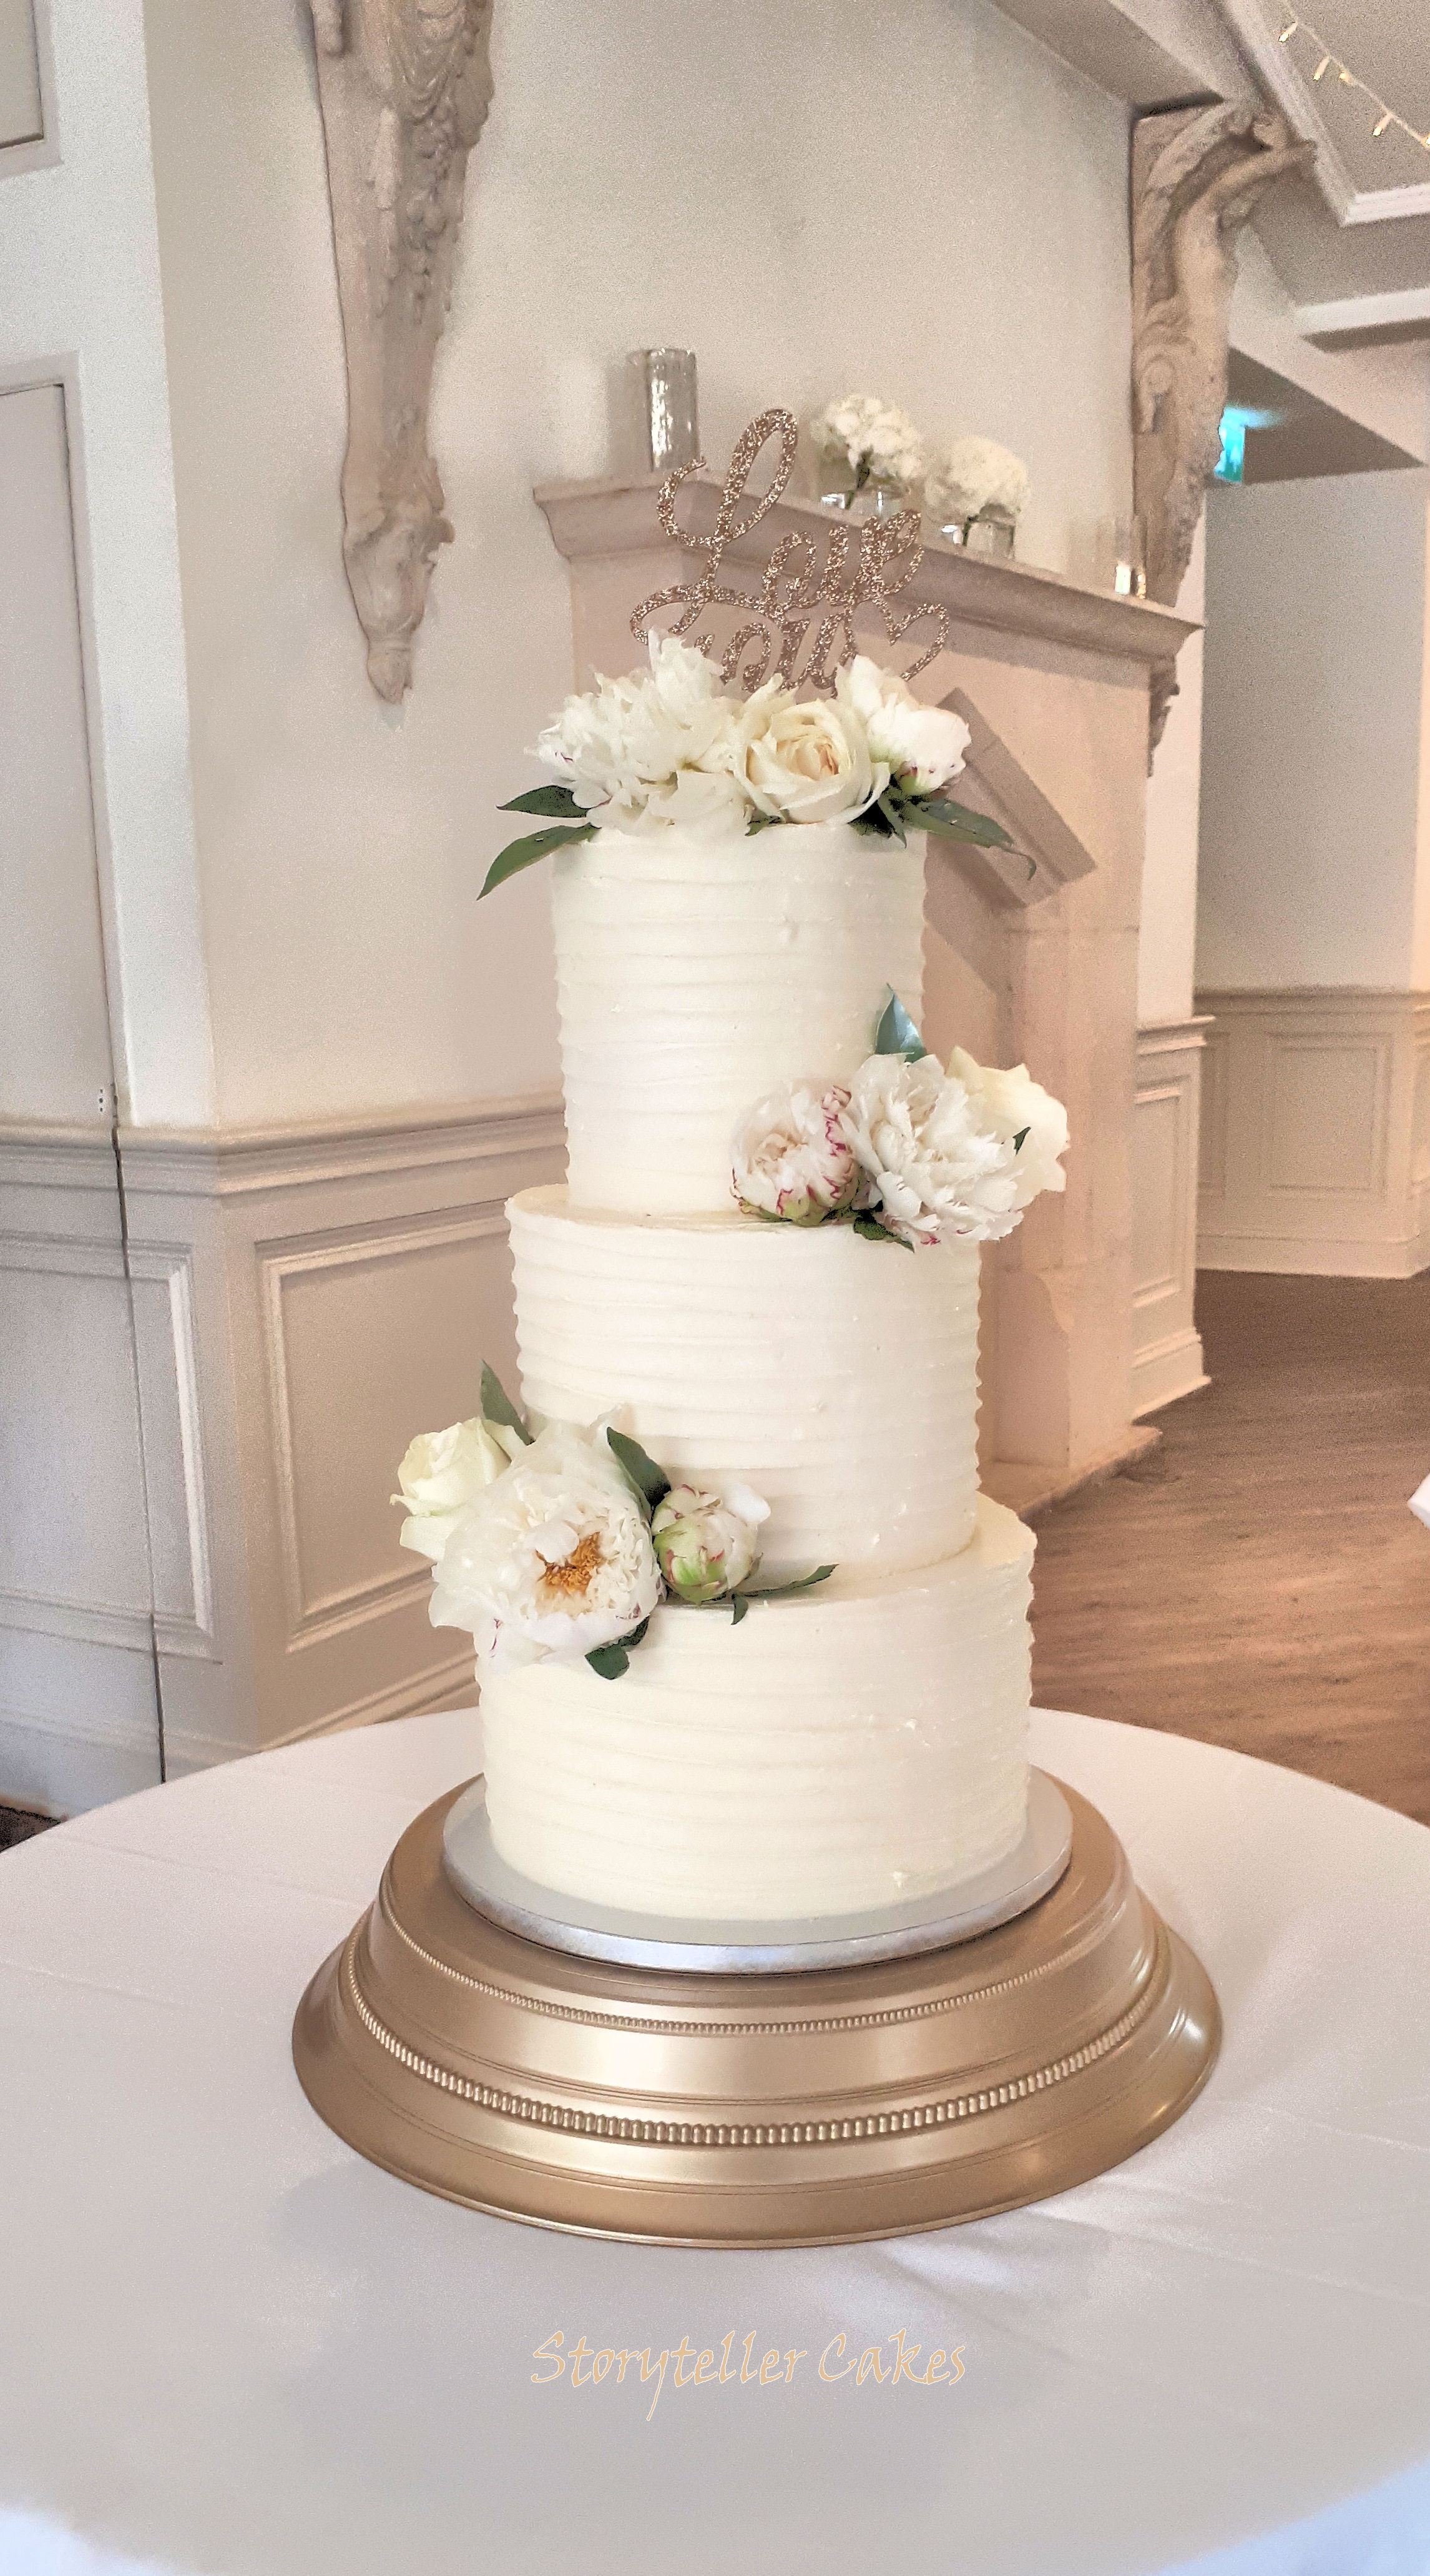 Buttercream Ruffle Wedding Cake With Fresh Peonies.jpg